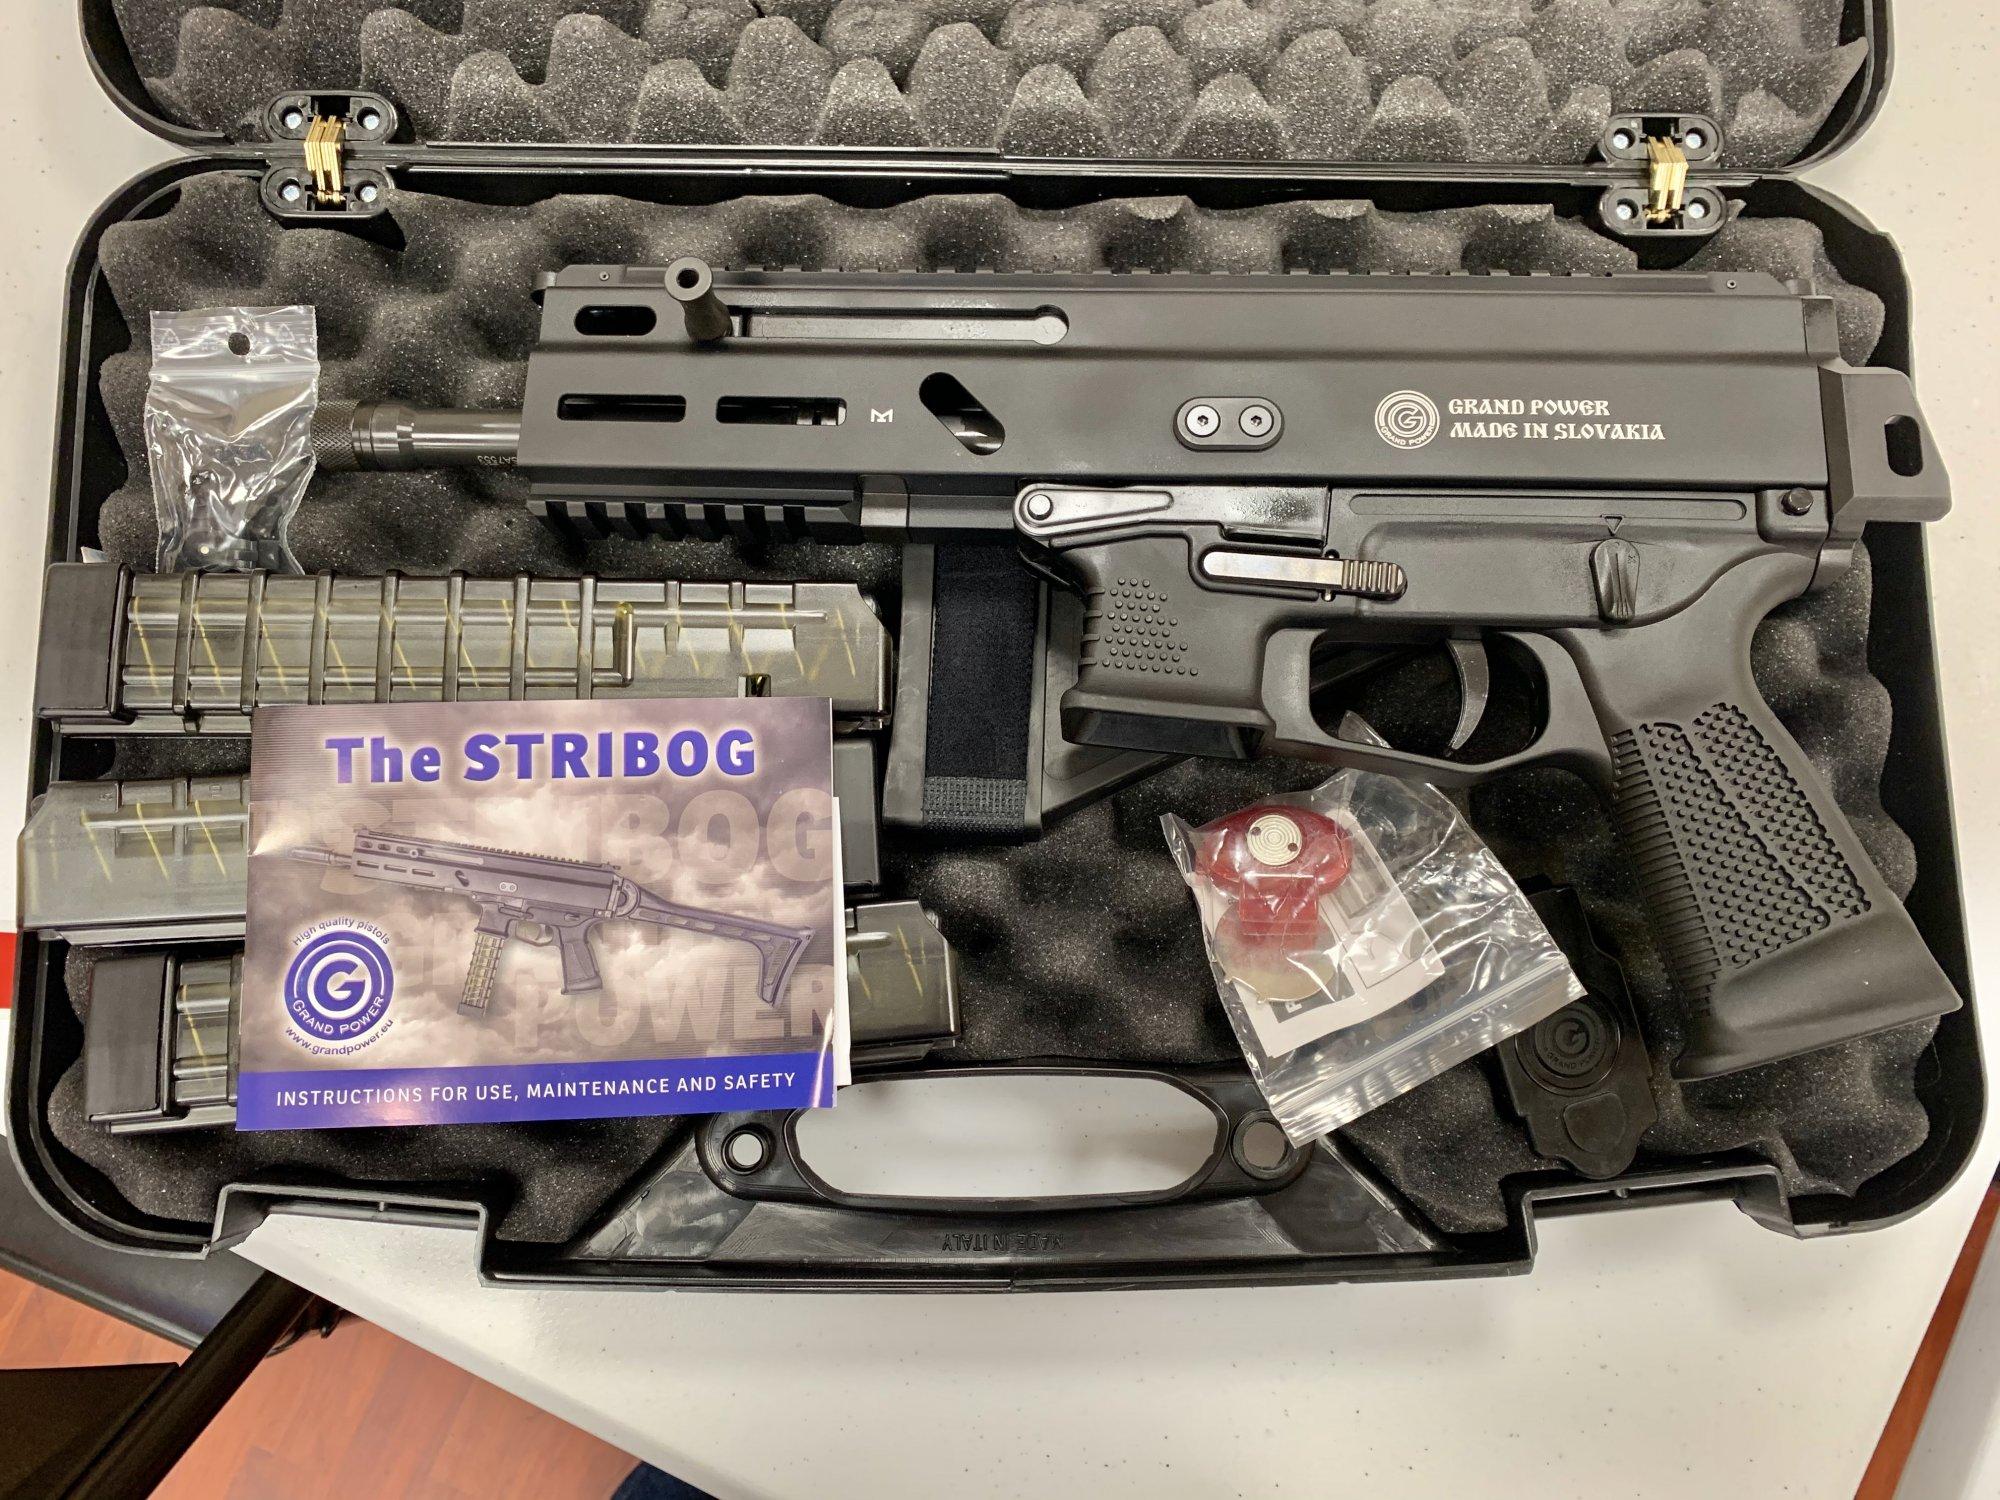 Grand Power Stribog 9mm Semi-Automatic Tactical Pistol